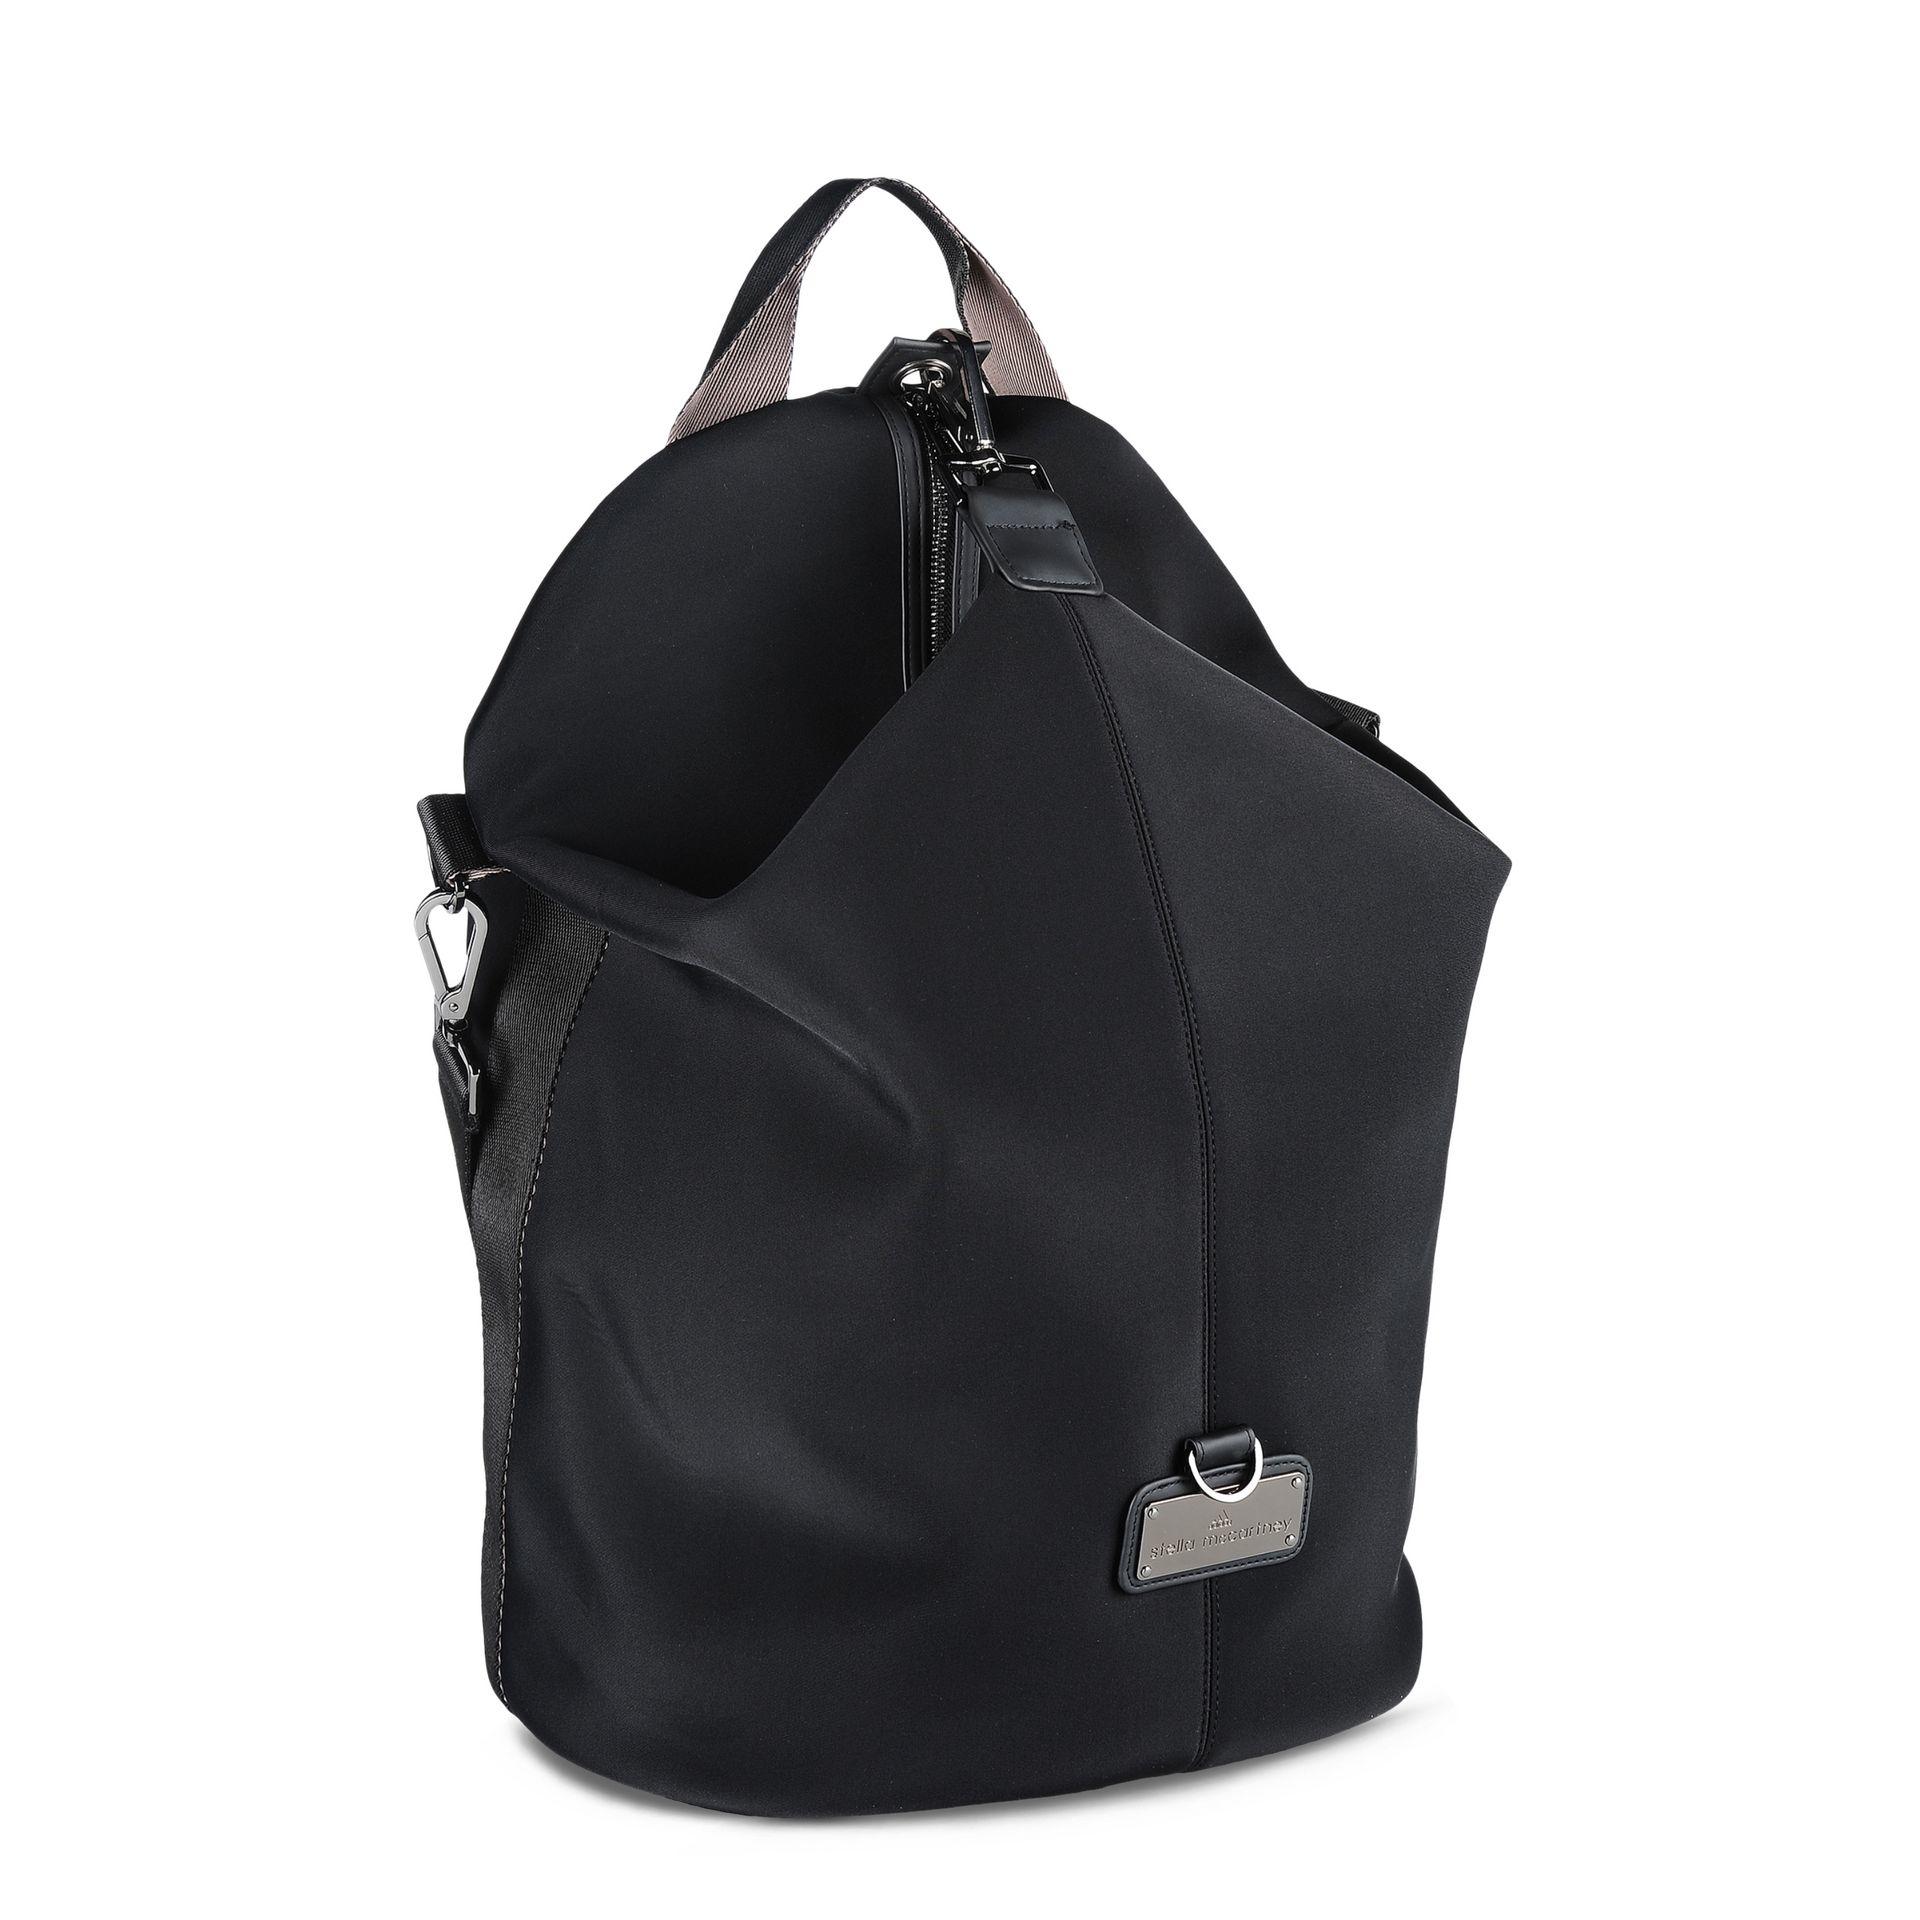 bfd59d2953fc Lyst - adidas By Stella McCartney Studio Neoprene Backpack in Black